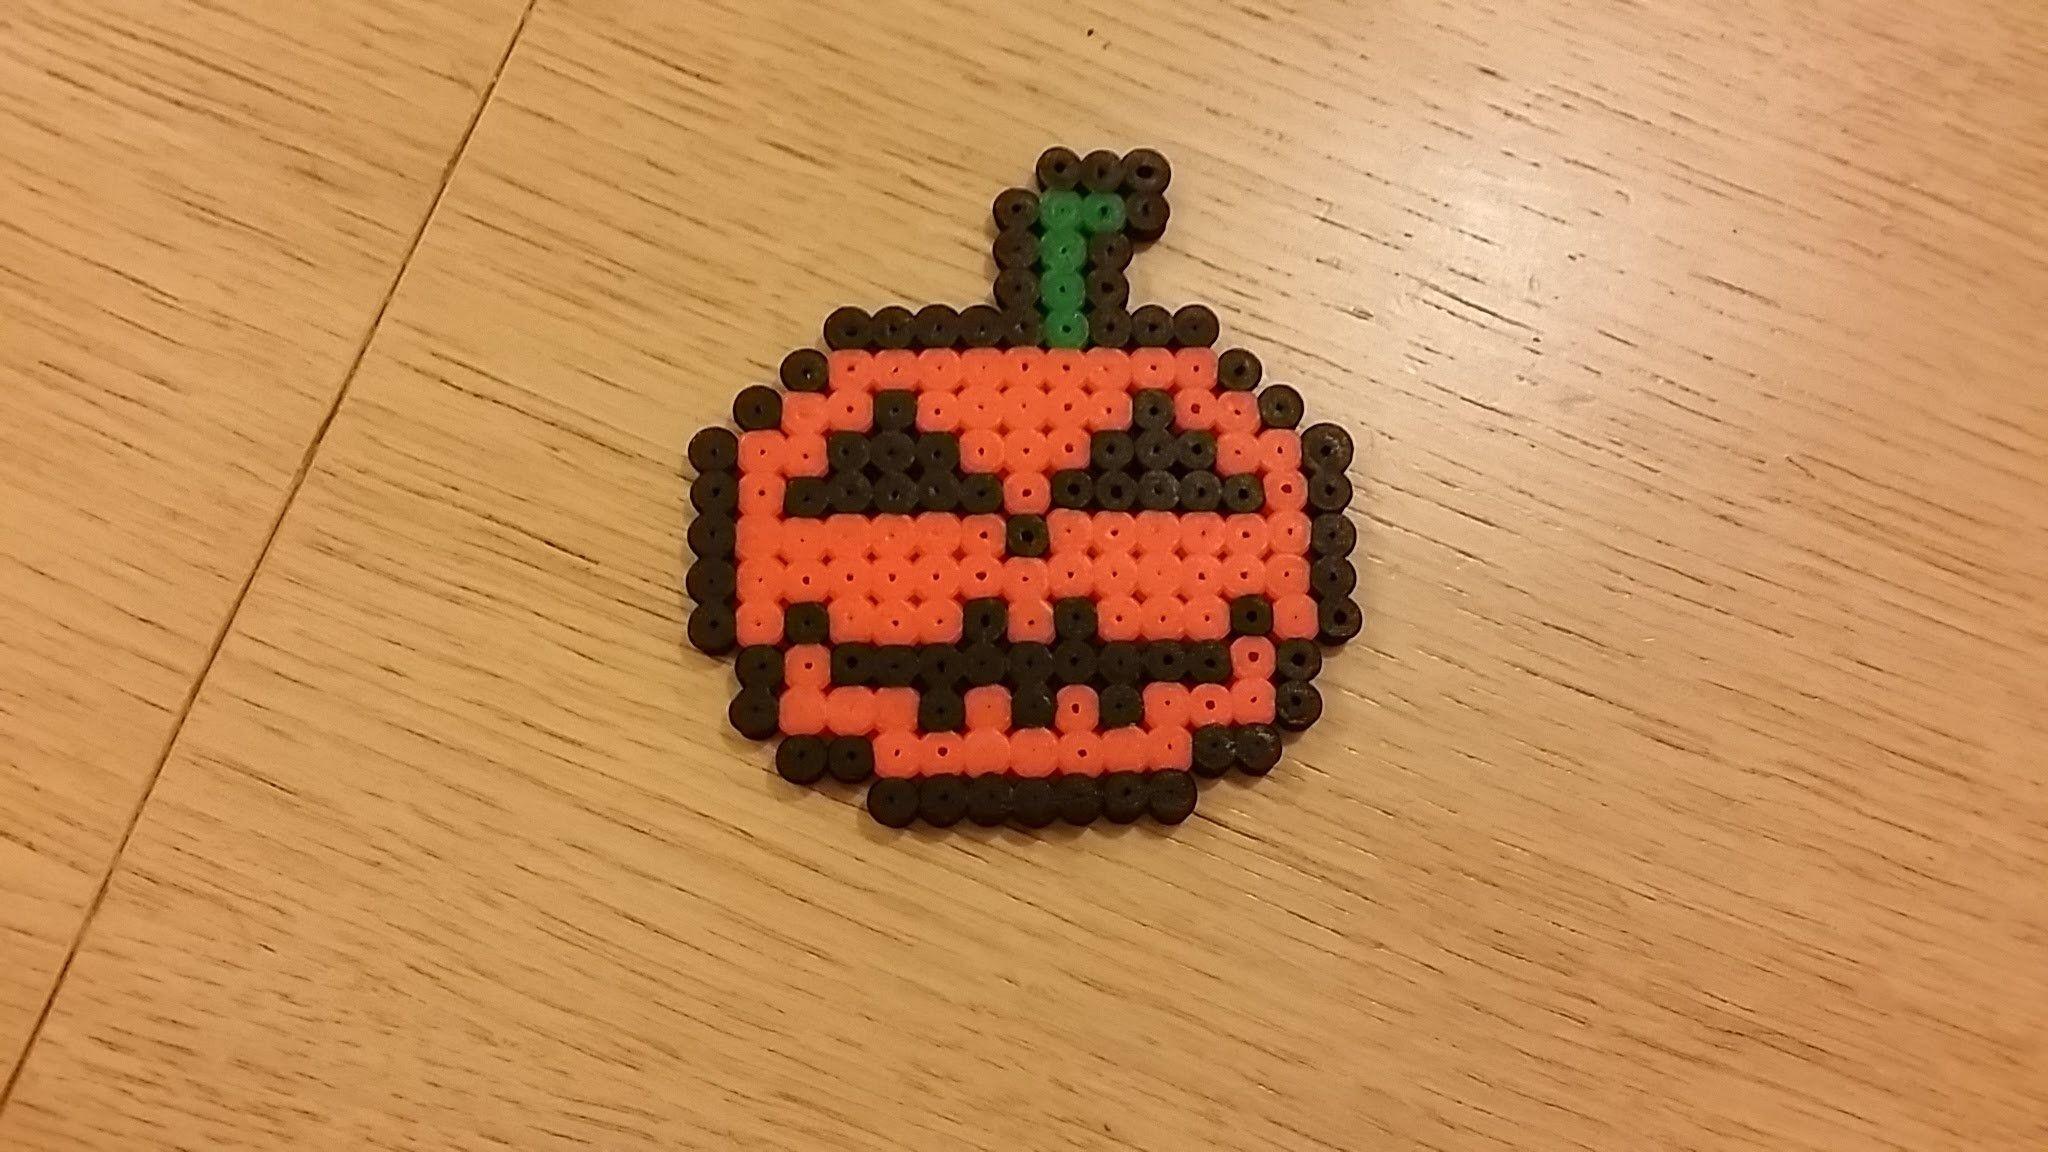 Zucca Di Halloween Pyssla.Tutorial Zucca Di Halloween In Pyssla Pyssla